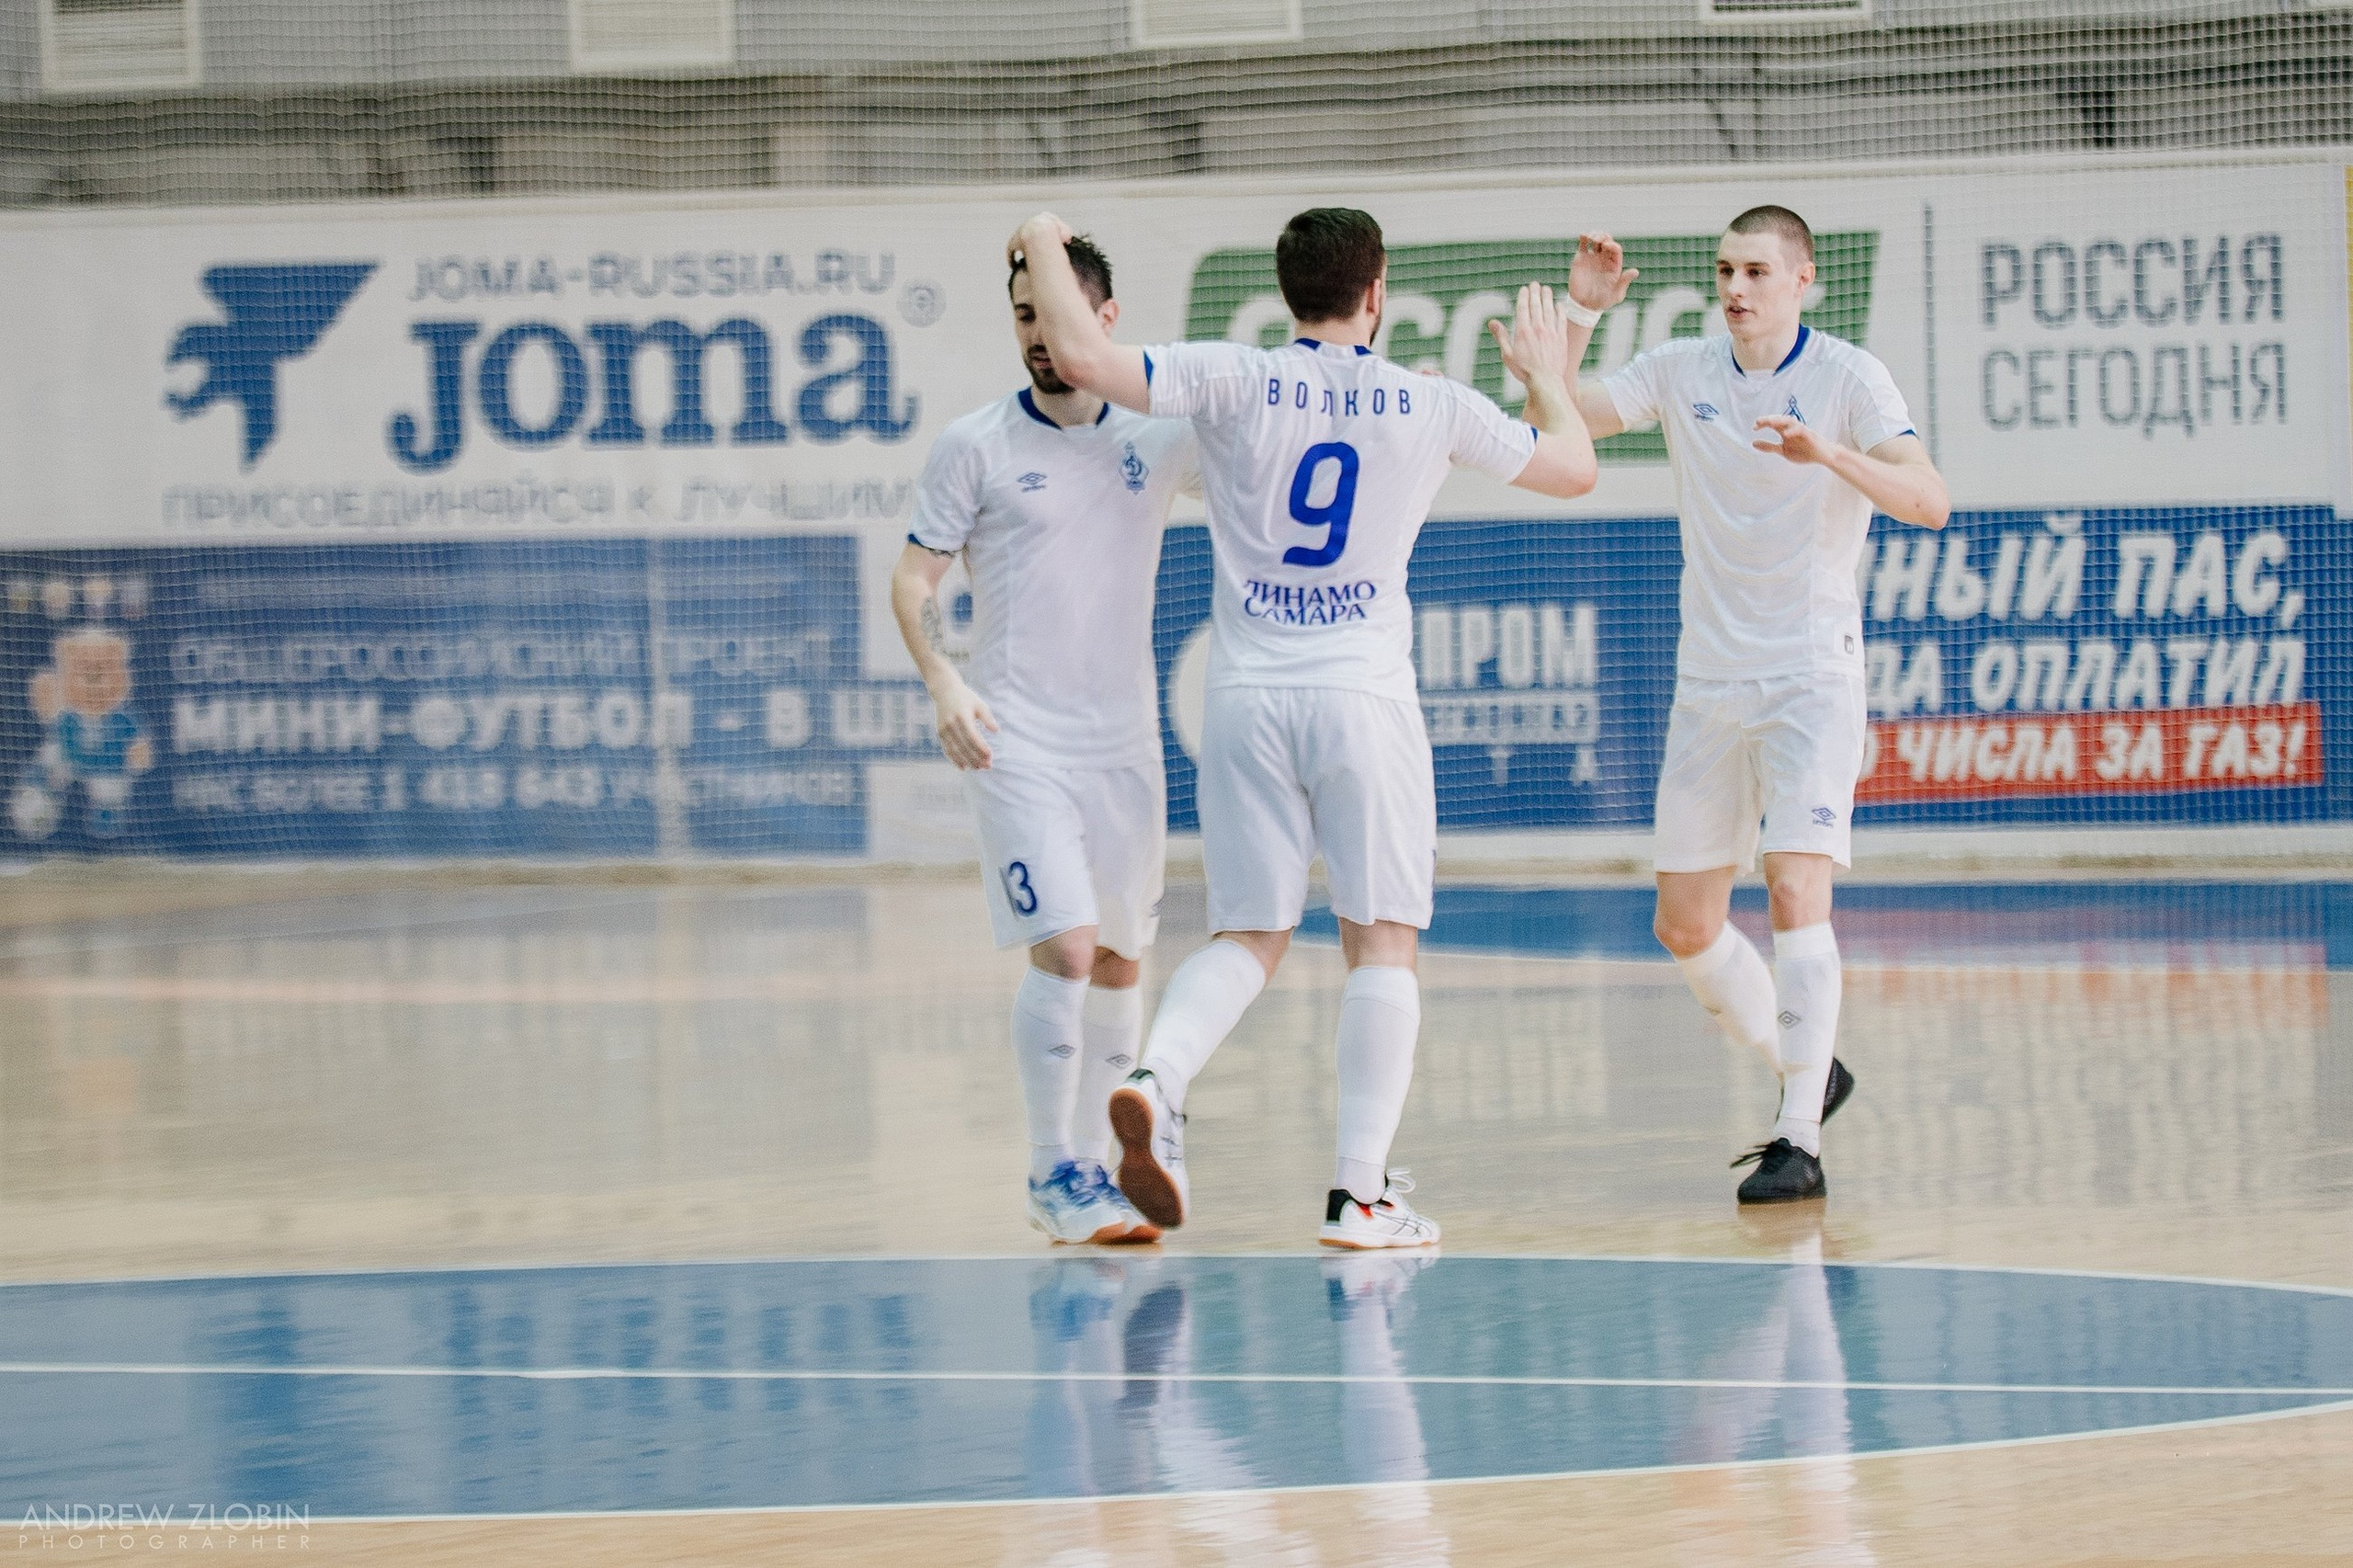 Новая генерация - Динамо-Самара